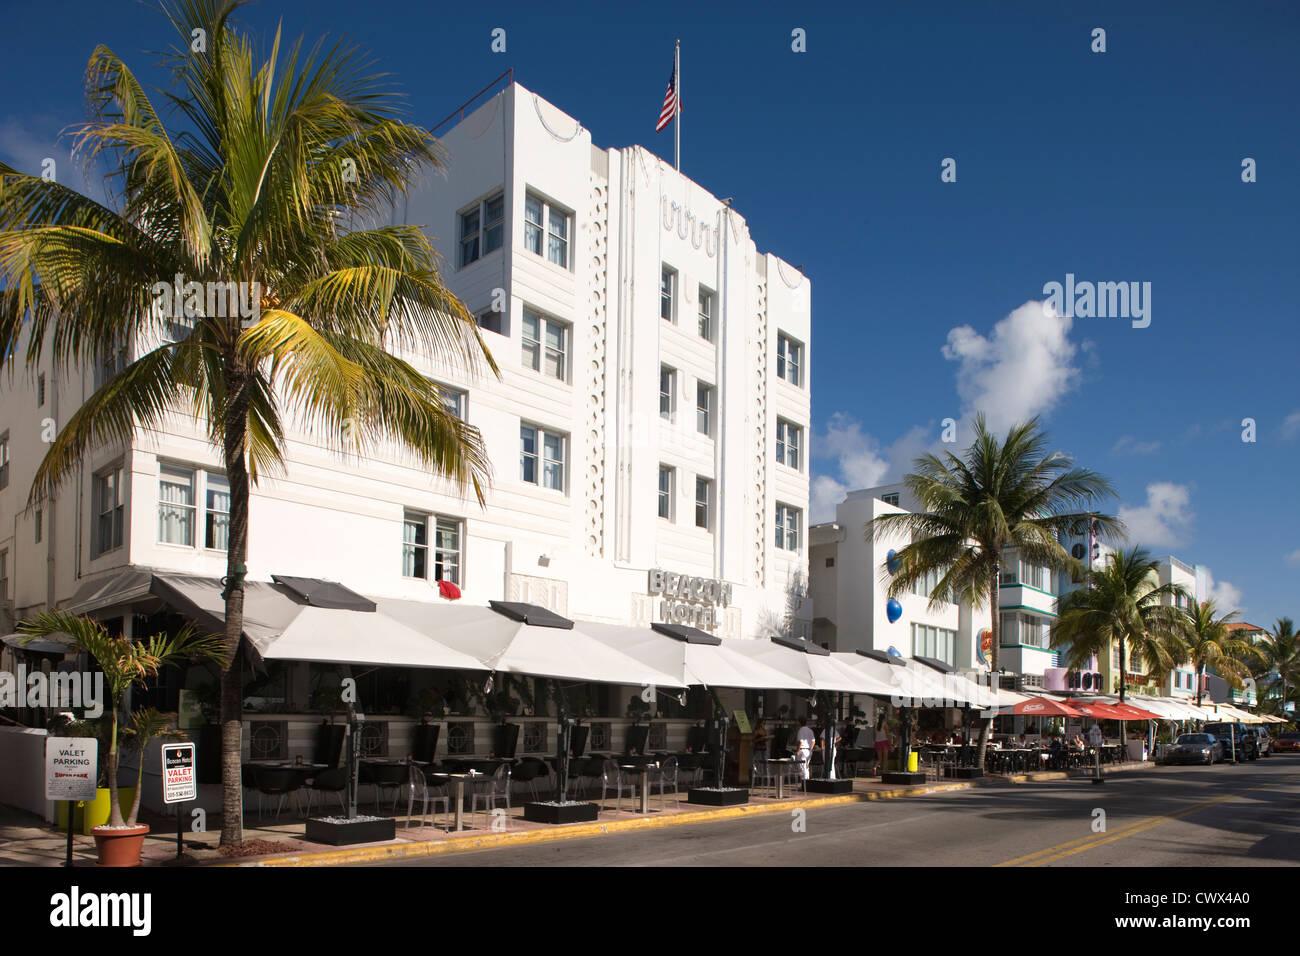 Beacon Hotel Miami